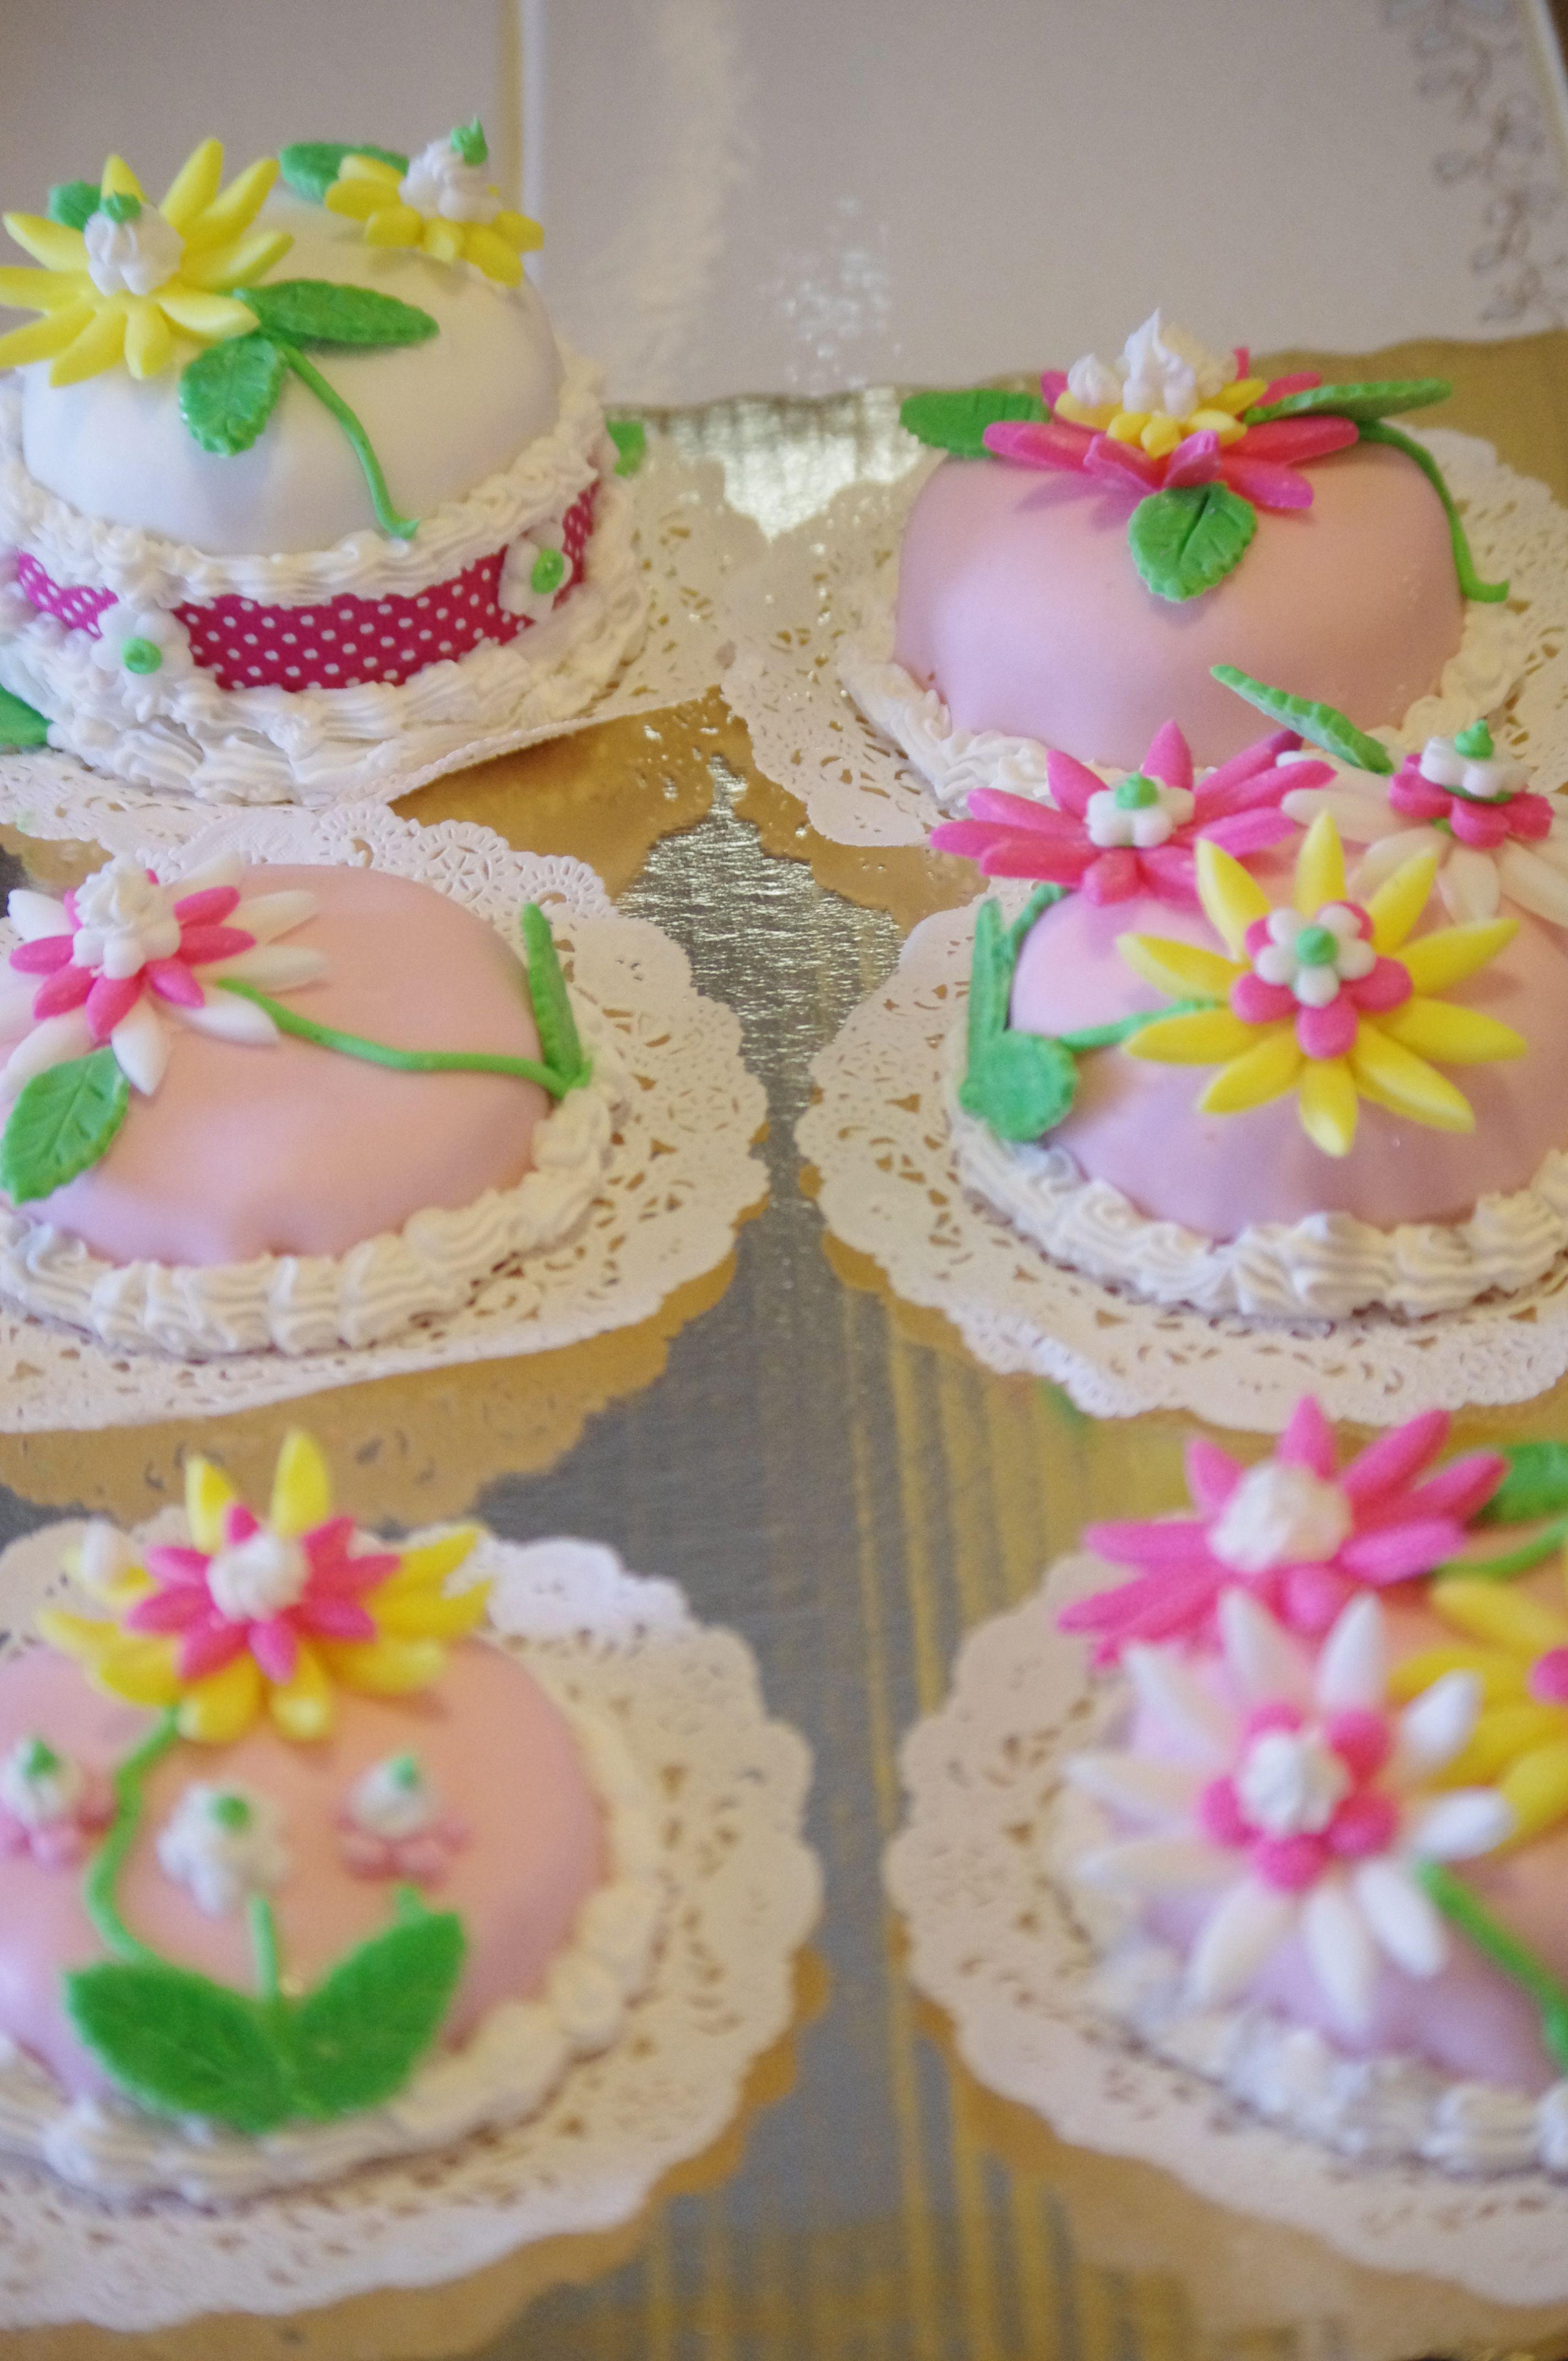 Fondant mini cakes for a breast cancer fundraiser.